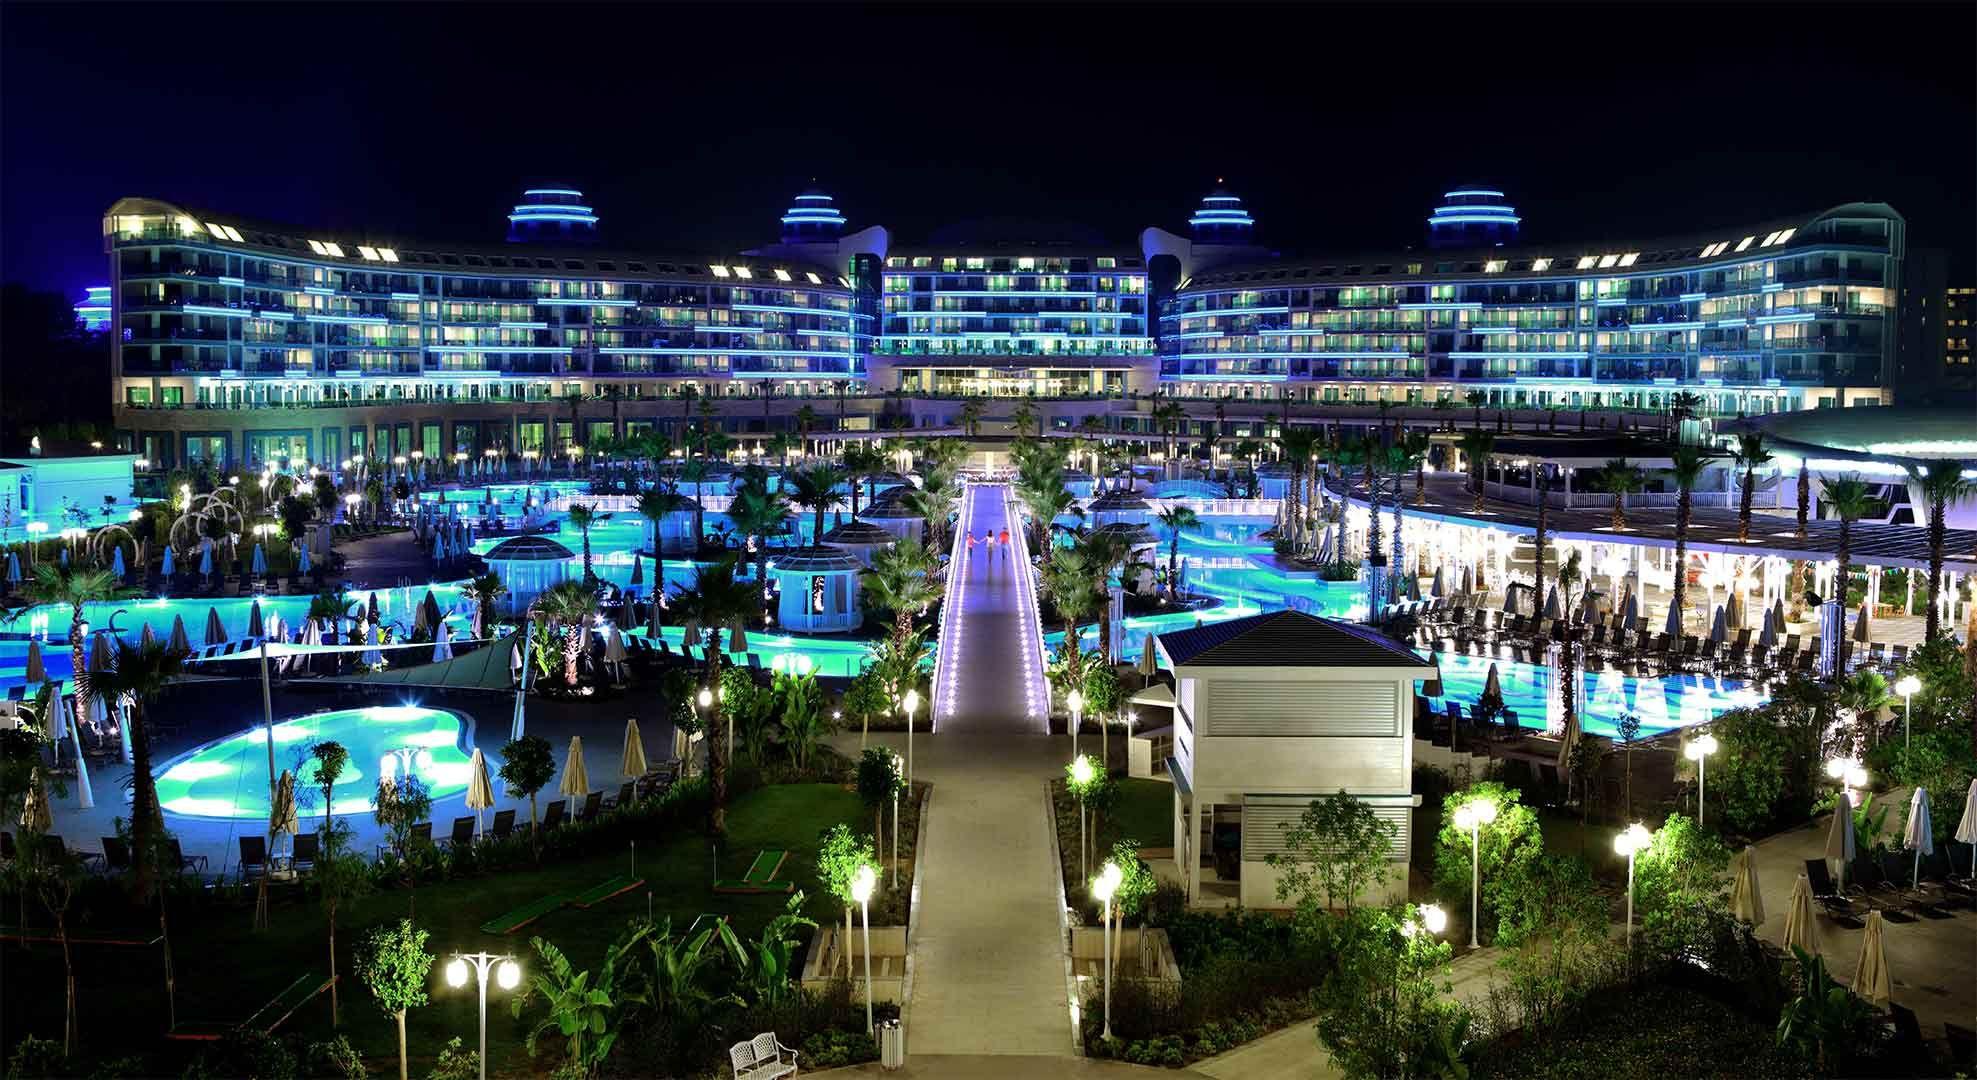 Choose Sueno Deluxe Hotel For The Wedding Hotel In 2020 Hotels In Turkey Hotel Deluxe Turkey Hotels